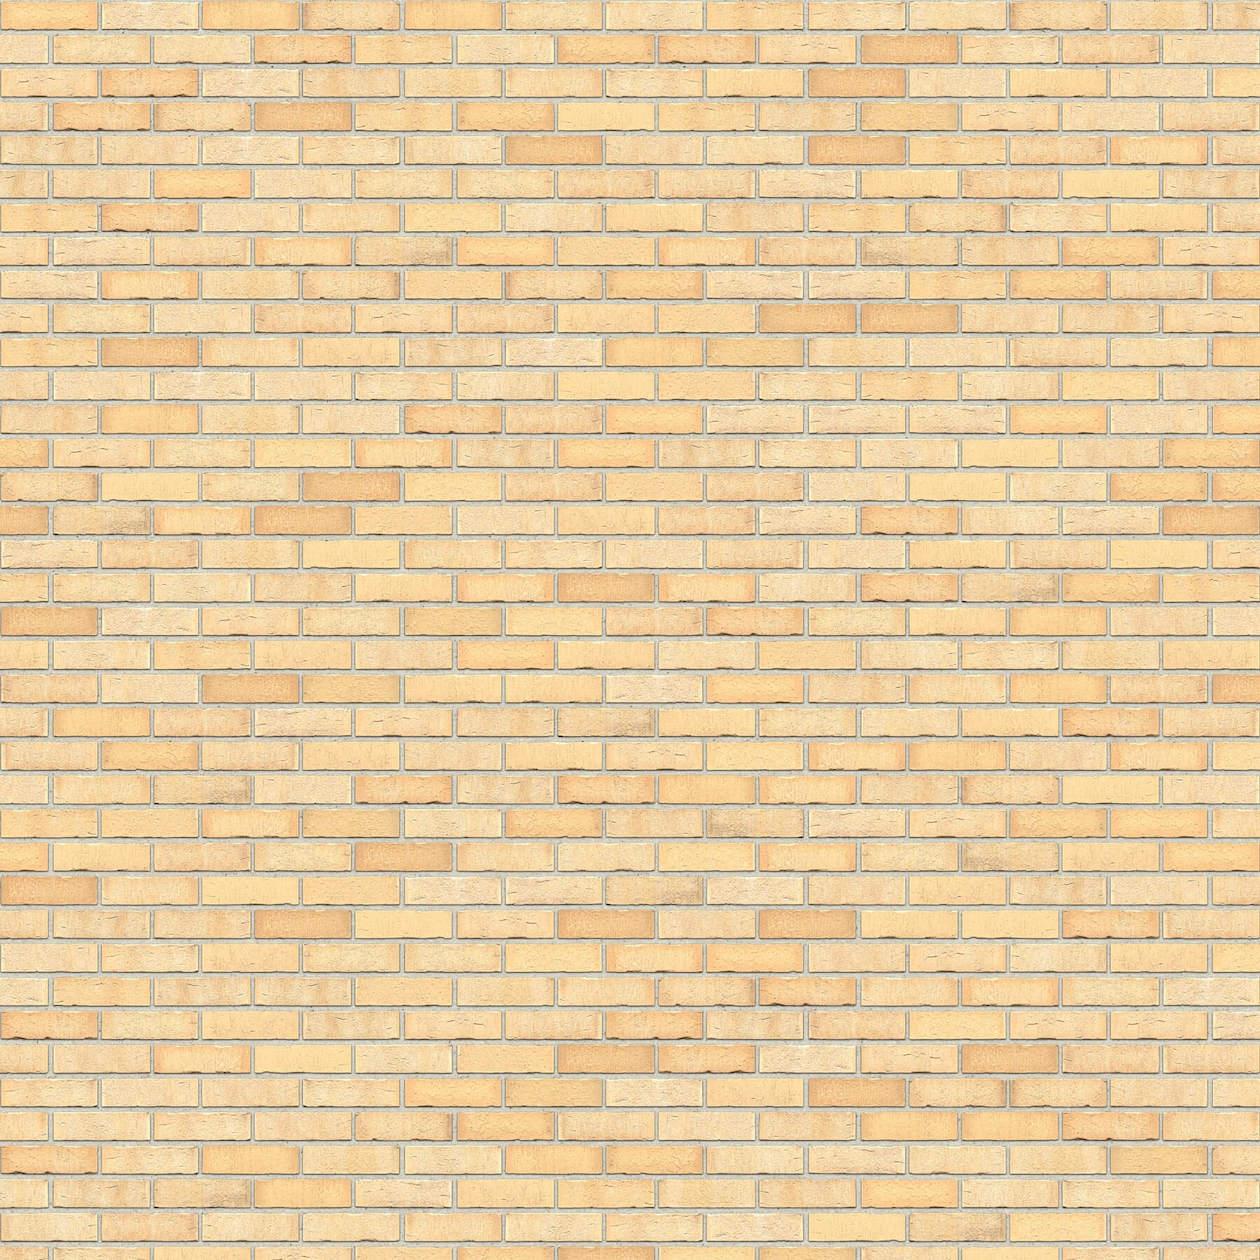 Puna-cigla-FeldHaus-Klinker-brick-house-Beograd-nf-k-724-Bela Fuga